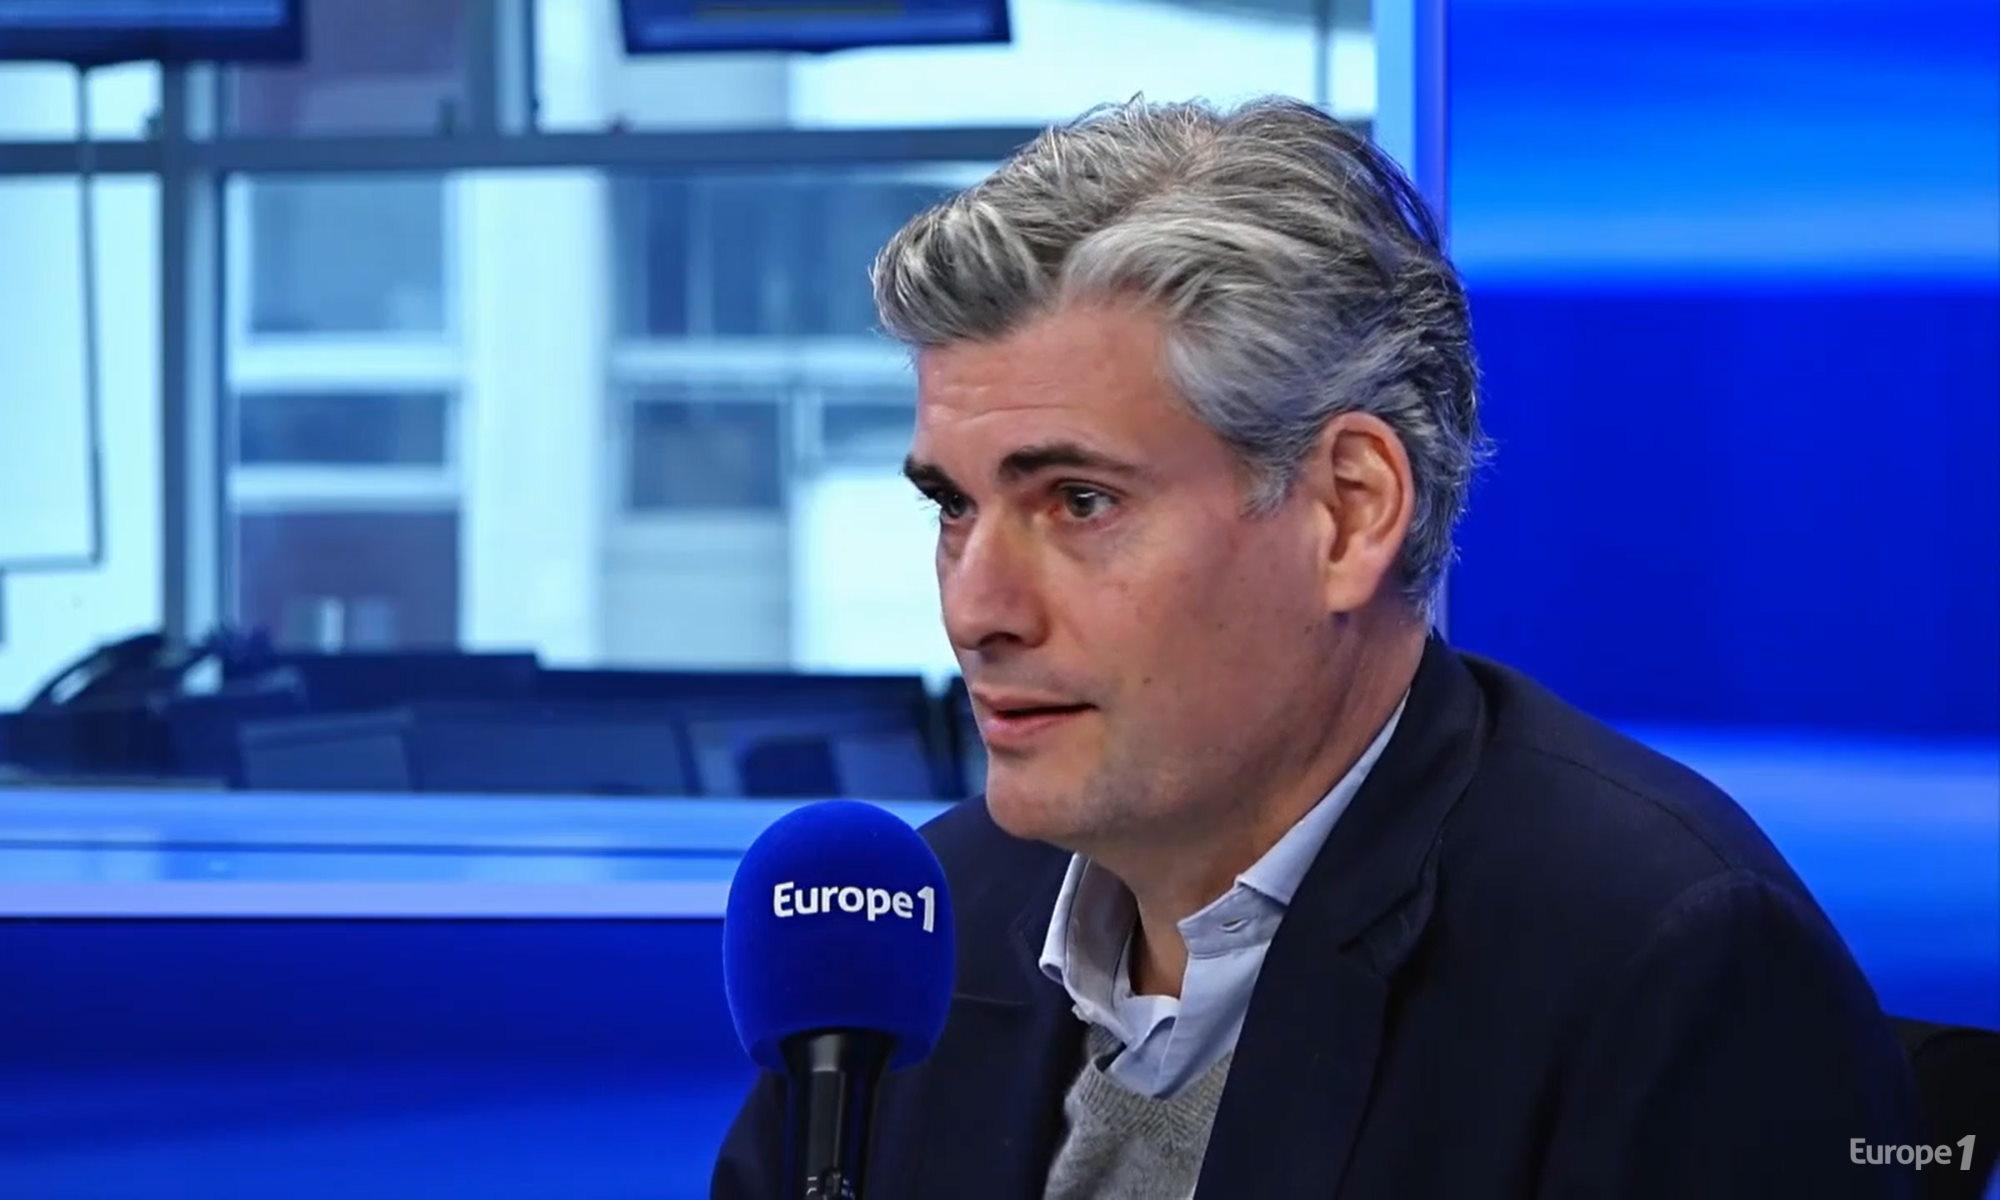 [Interview de Florian Reinaud] Europe 1 : Concilio, la solution de conciergerie médicale